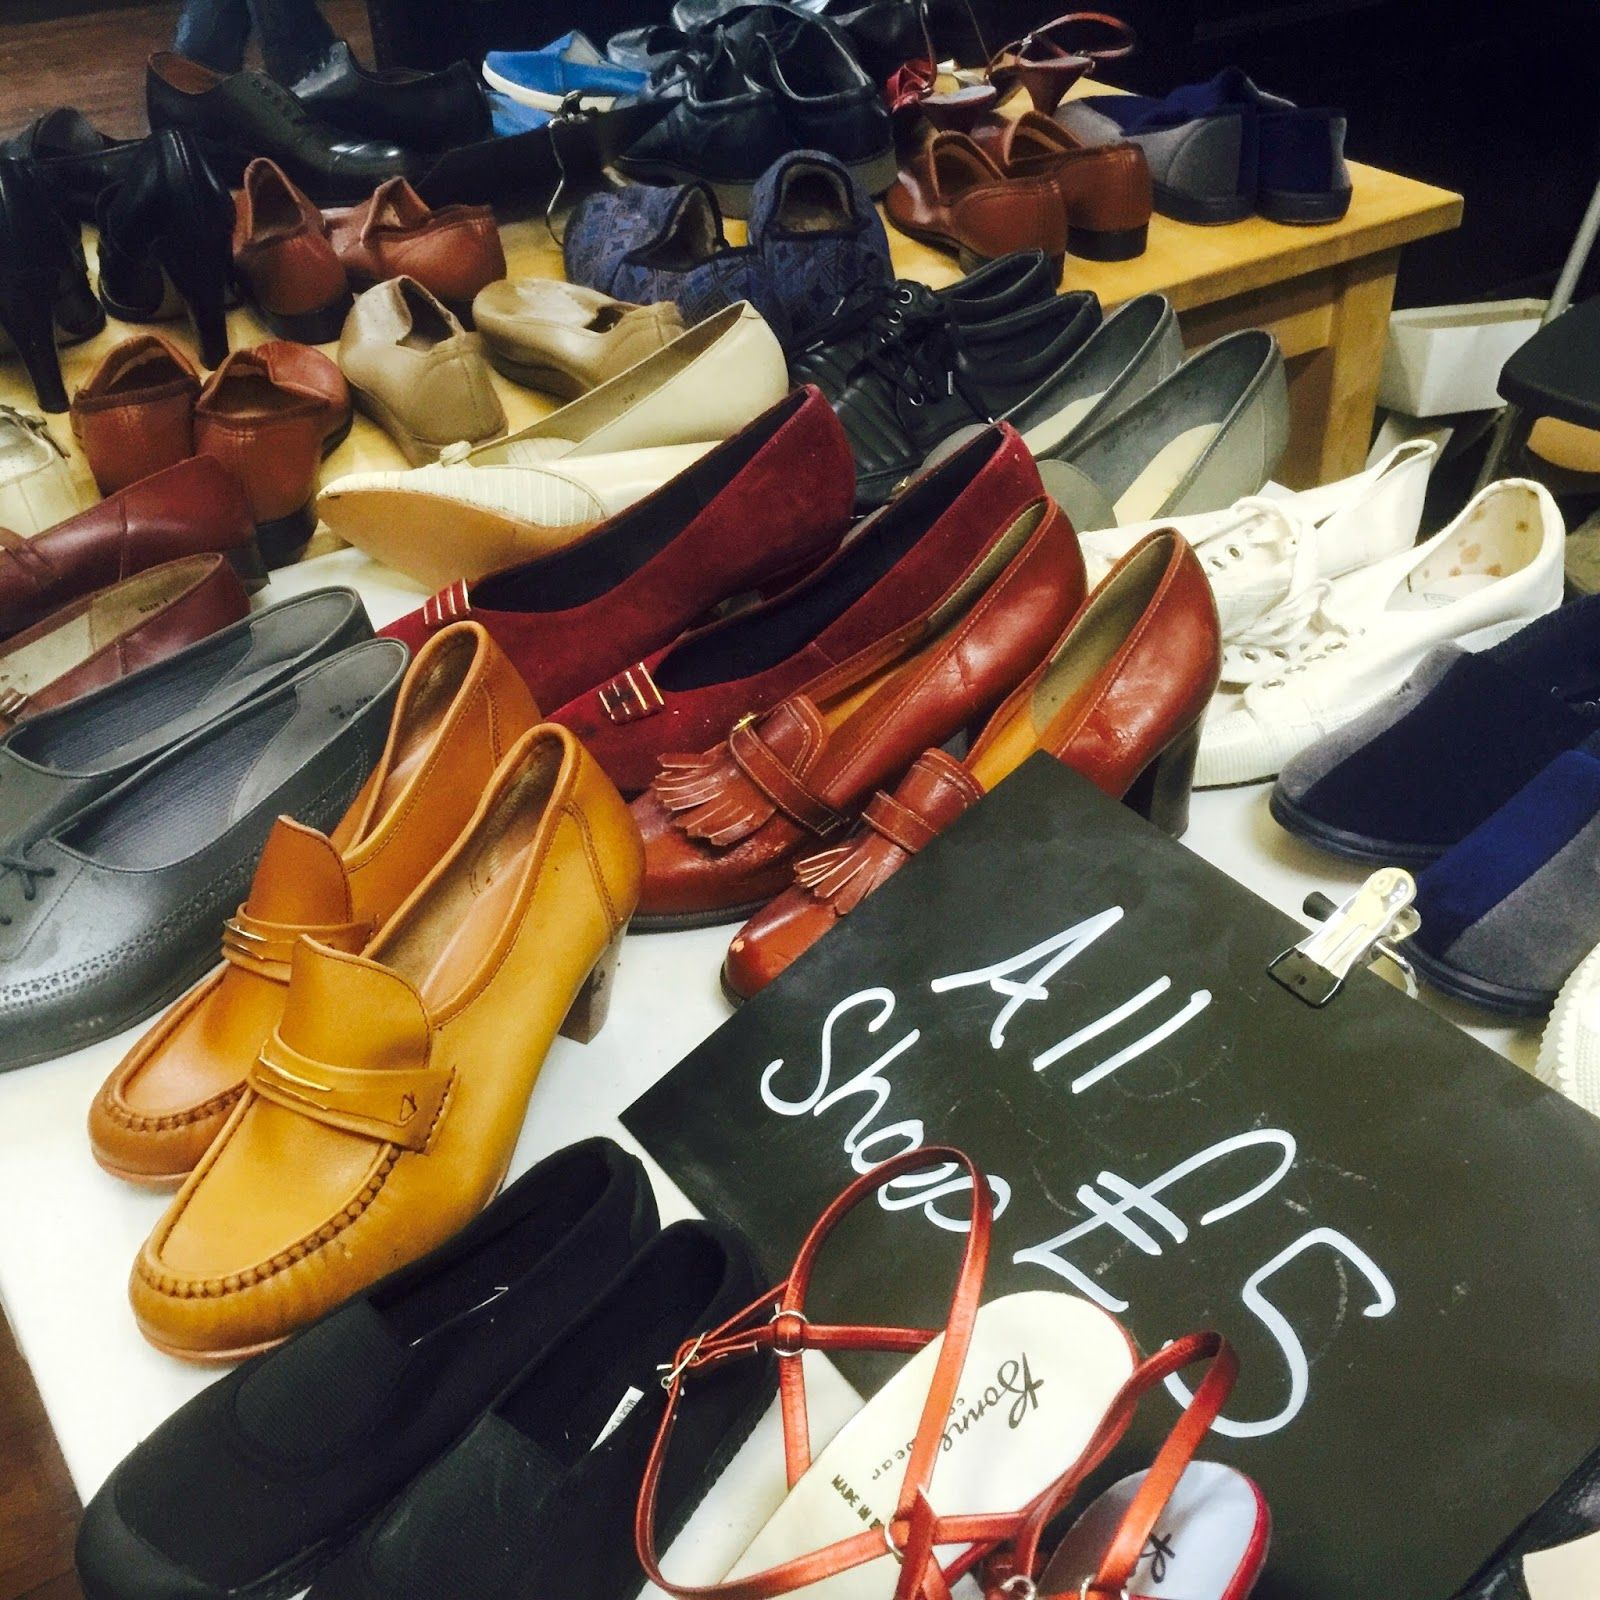 Vintage Kilo Sale Leeds The Tips Fashion Fashion Oxford Shoes Dress Shoes Men